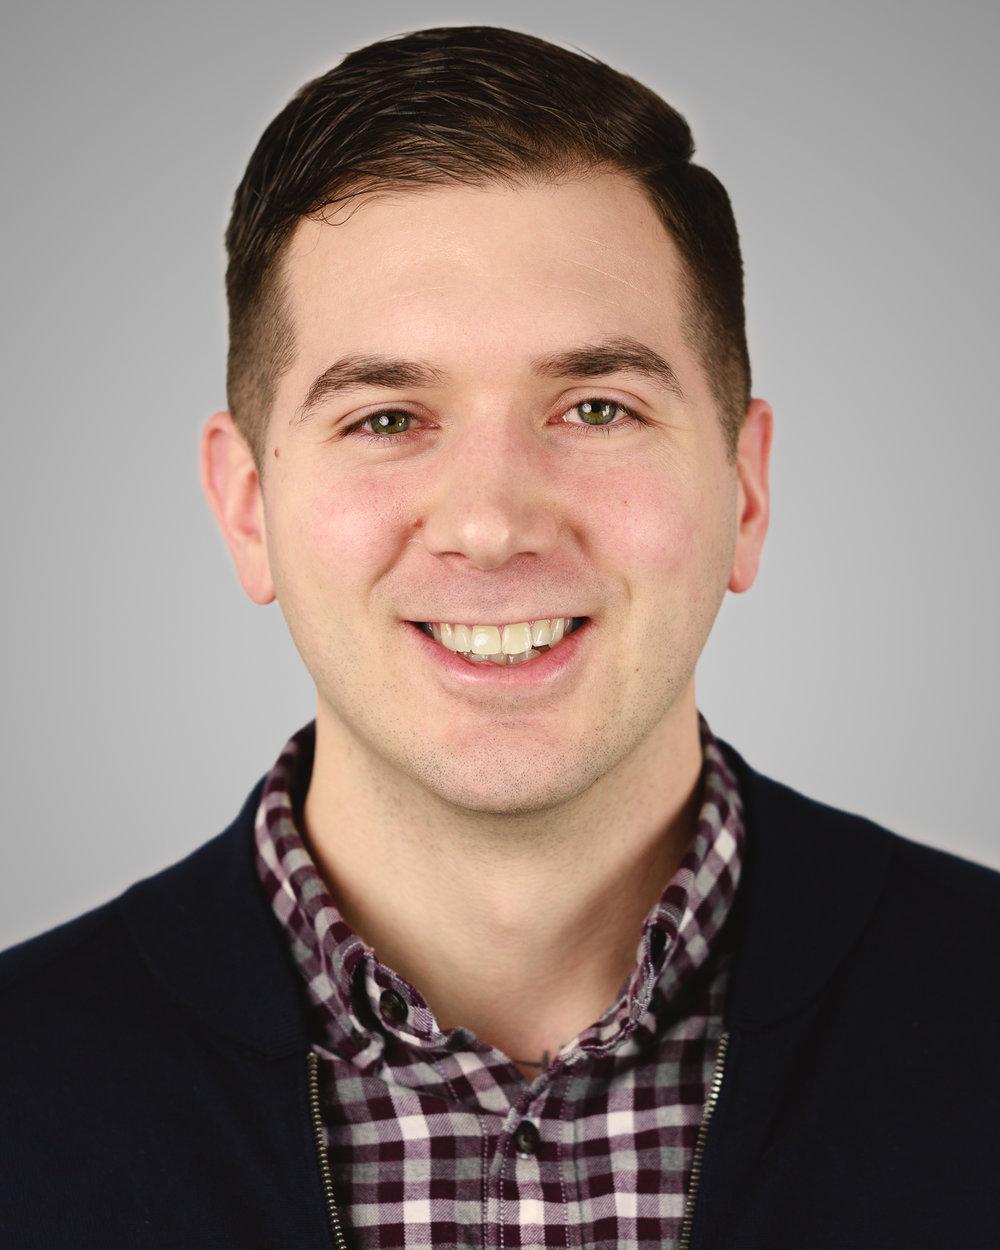 Ryan Mrdeza - Chief Operating Officer